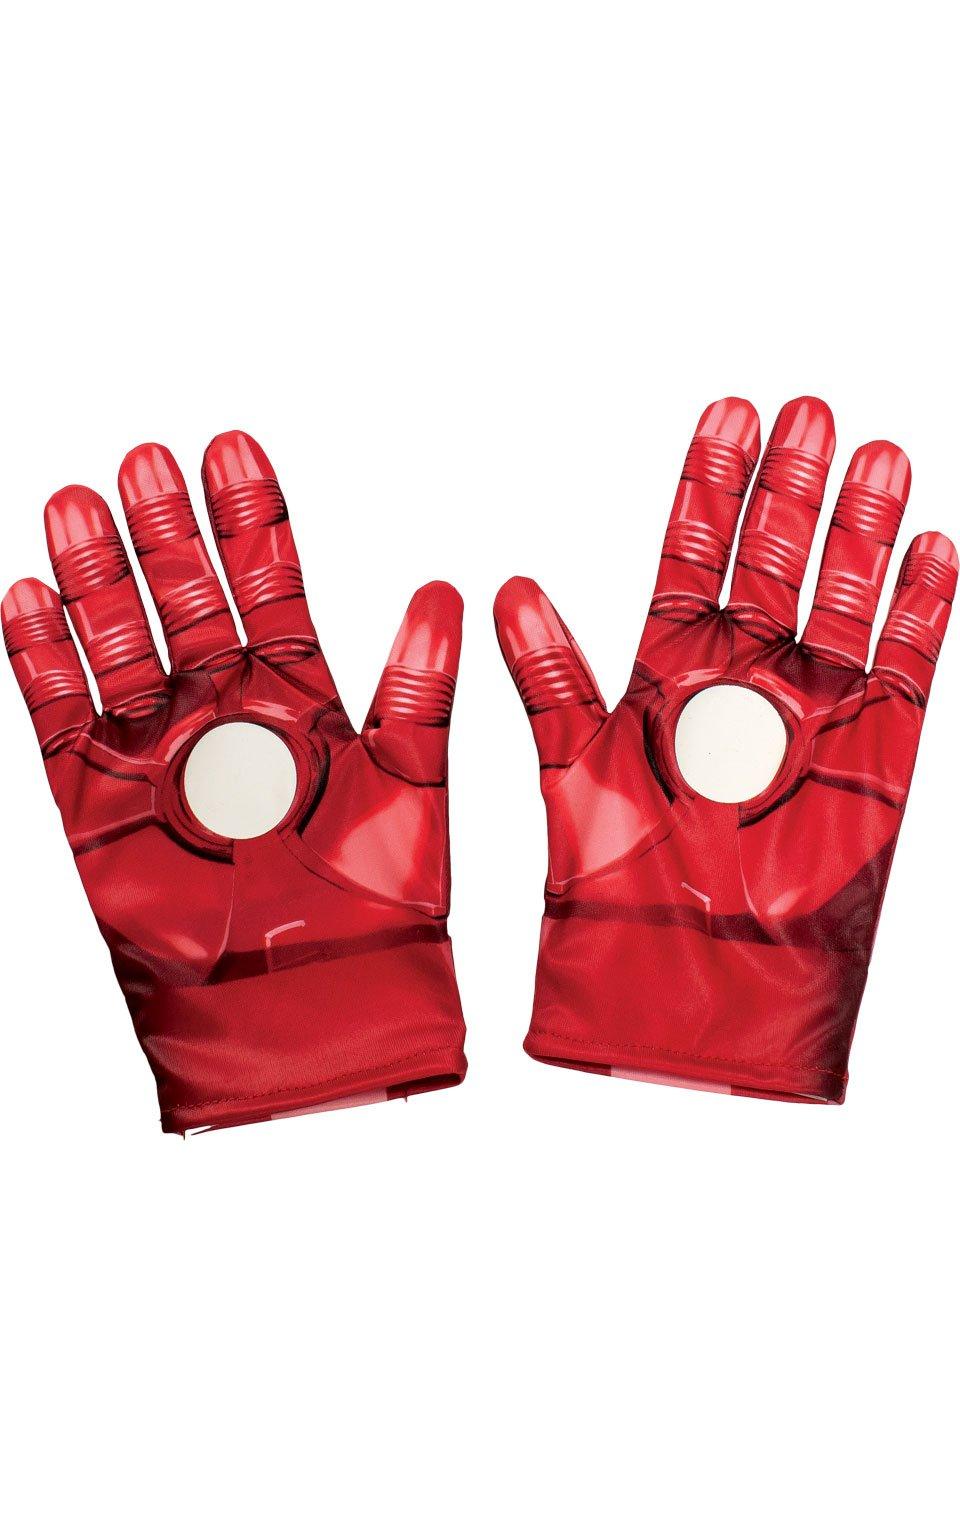 Rubie's Marvel Avengers Assemble Iron Man Gloves, Child Size